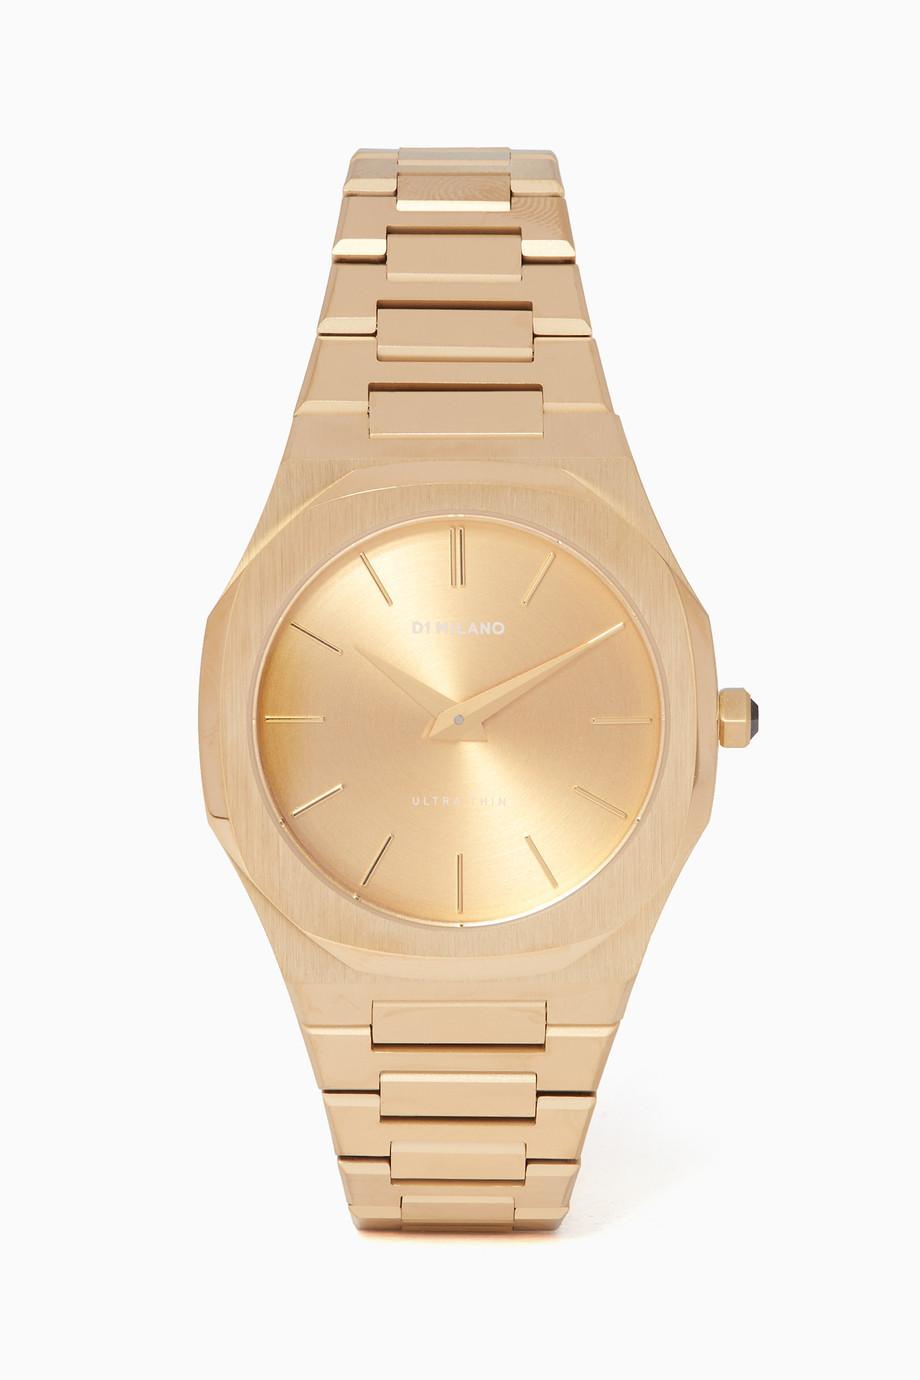 df6ada04c تسوق ساعة رفيعة ذهبية D1 Milano ذهبي للرجال | اُناس